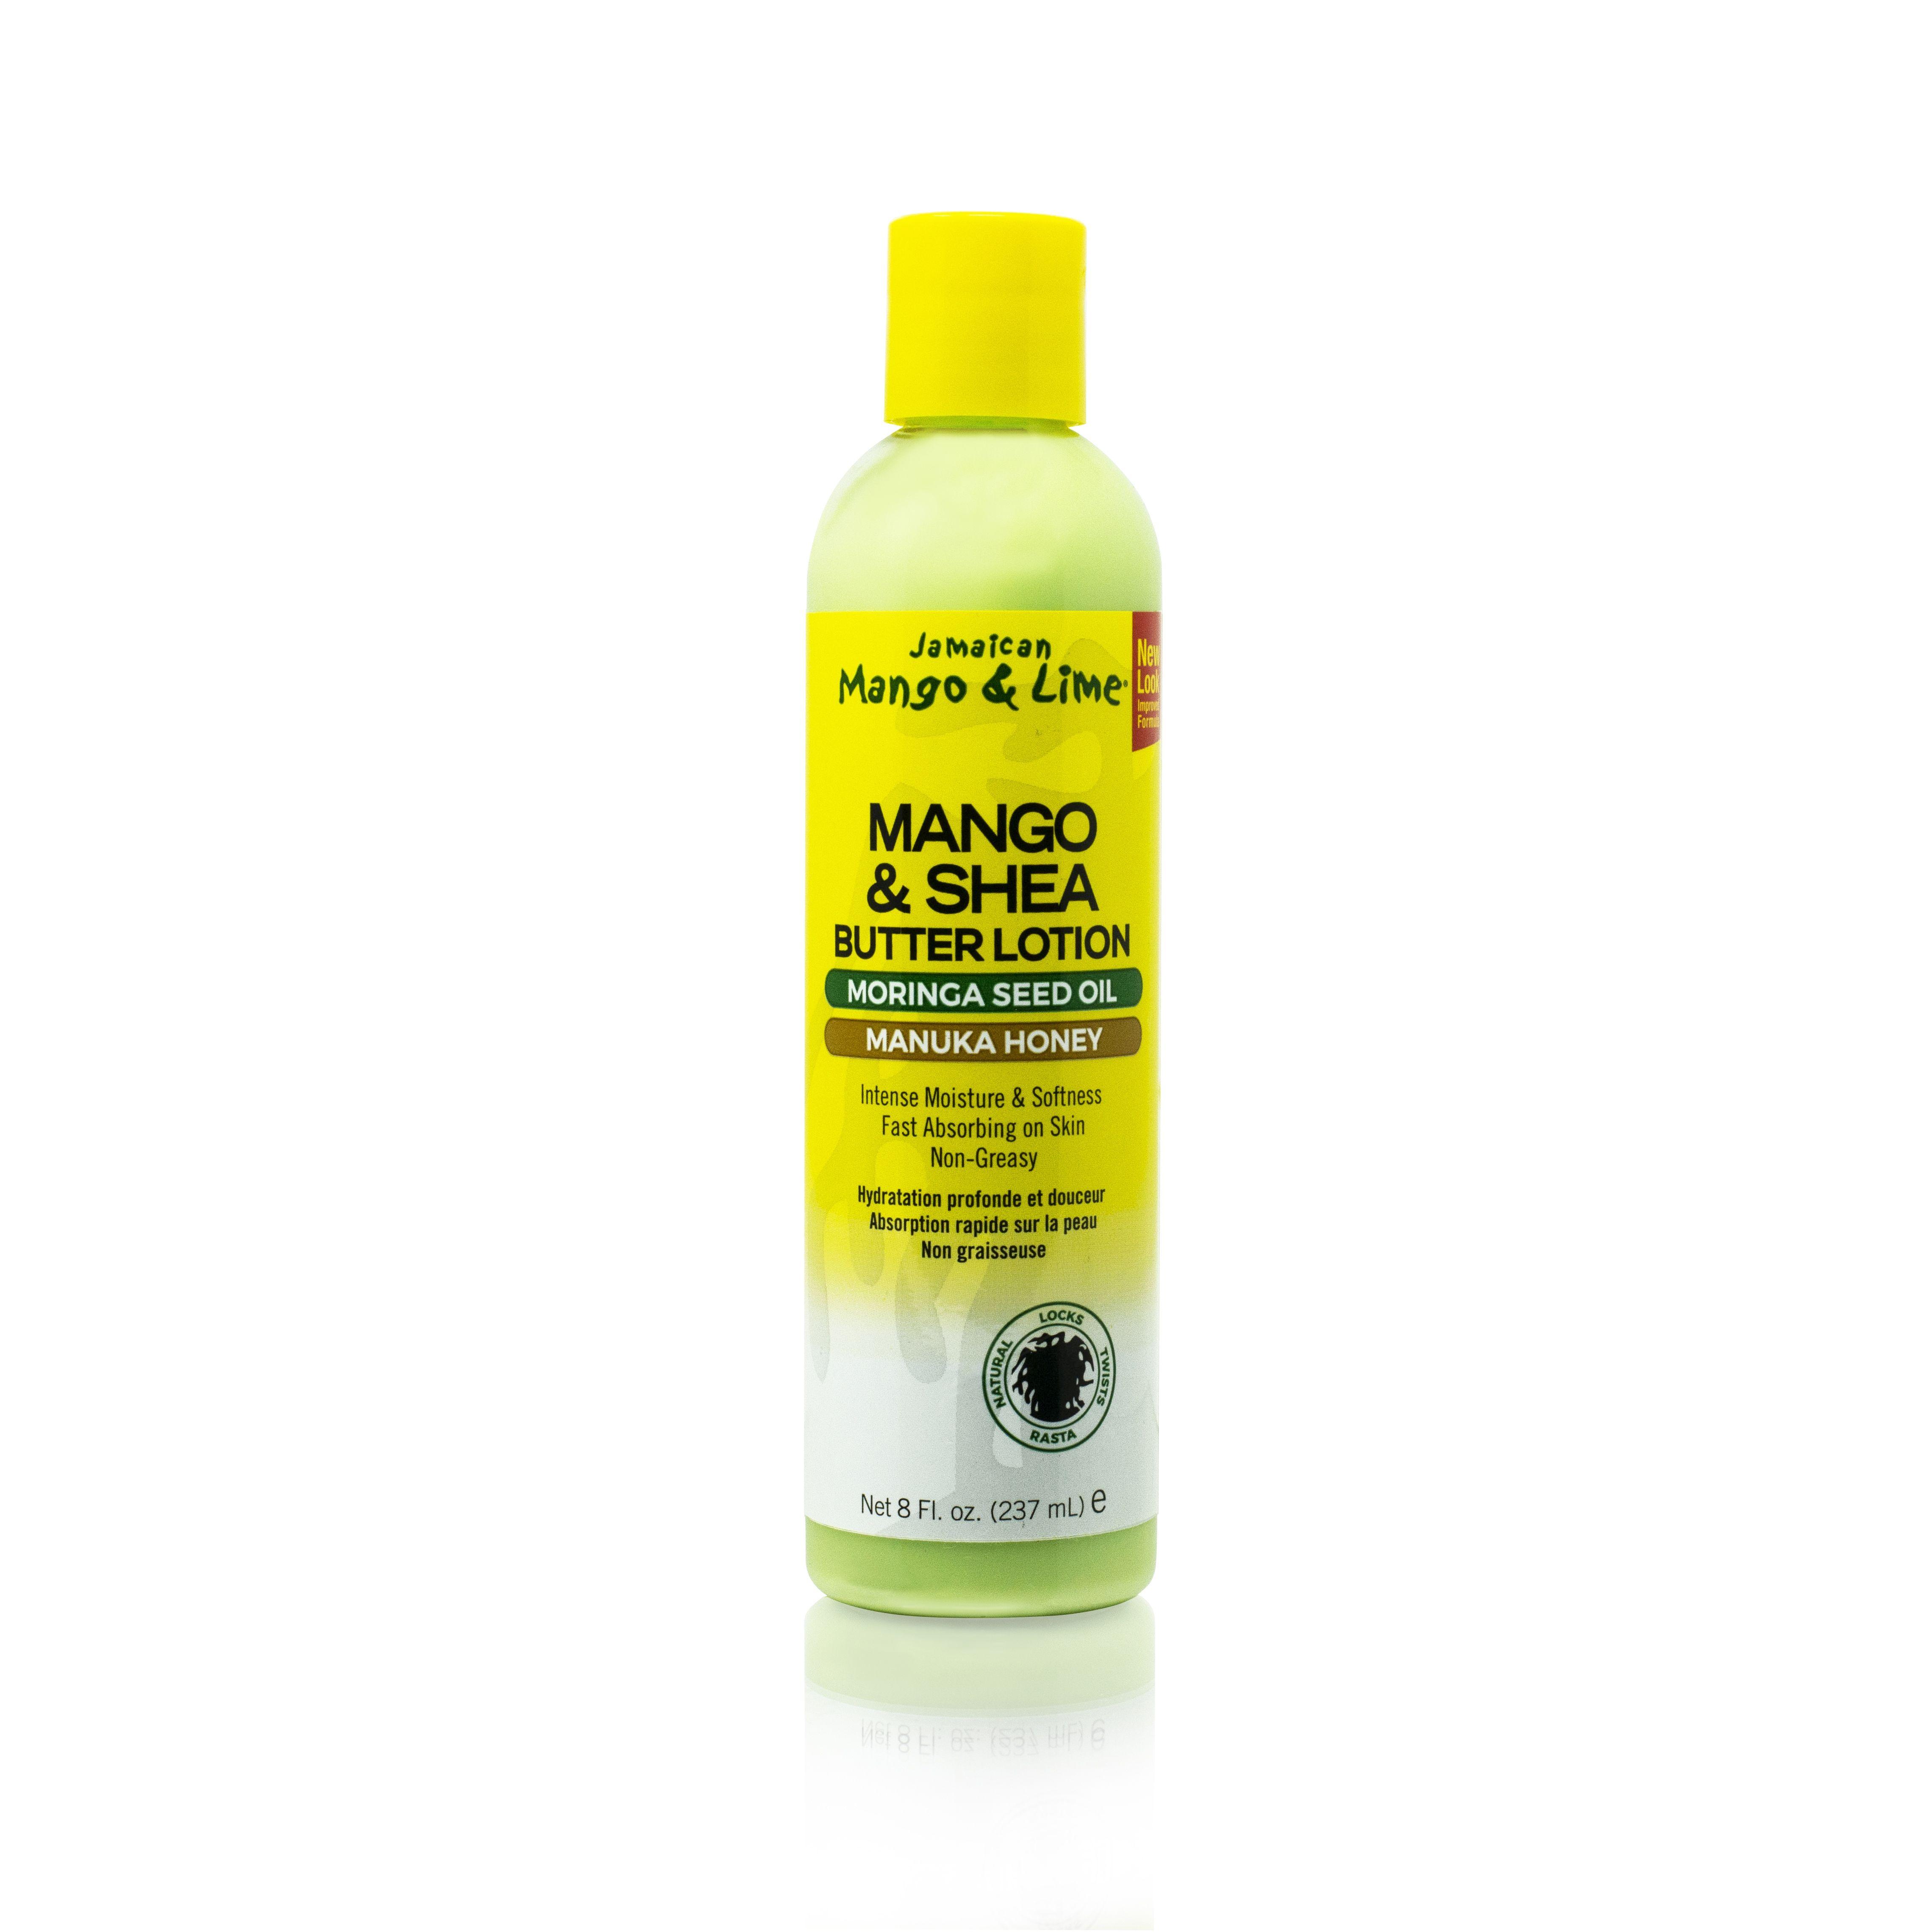 Jamaican Mango & Lime Mango Shea Butter Lotion - 8oz